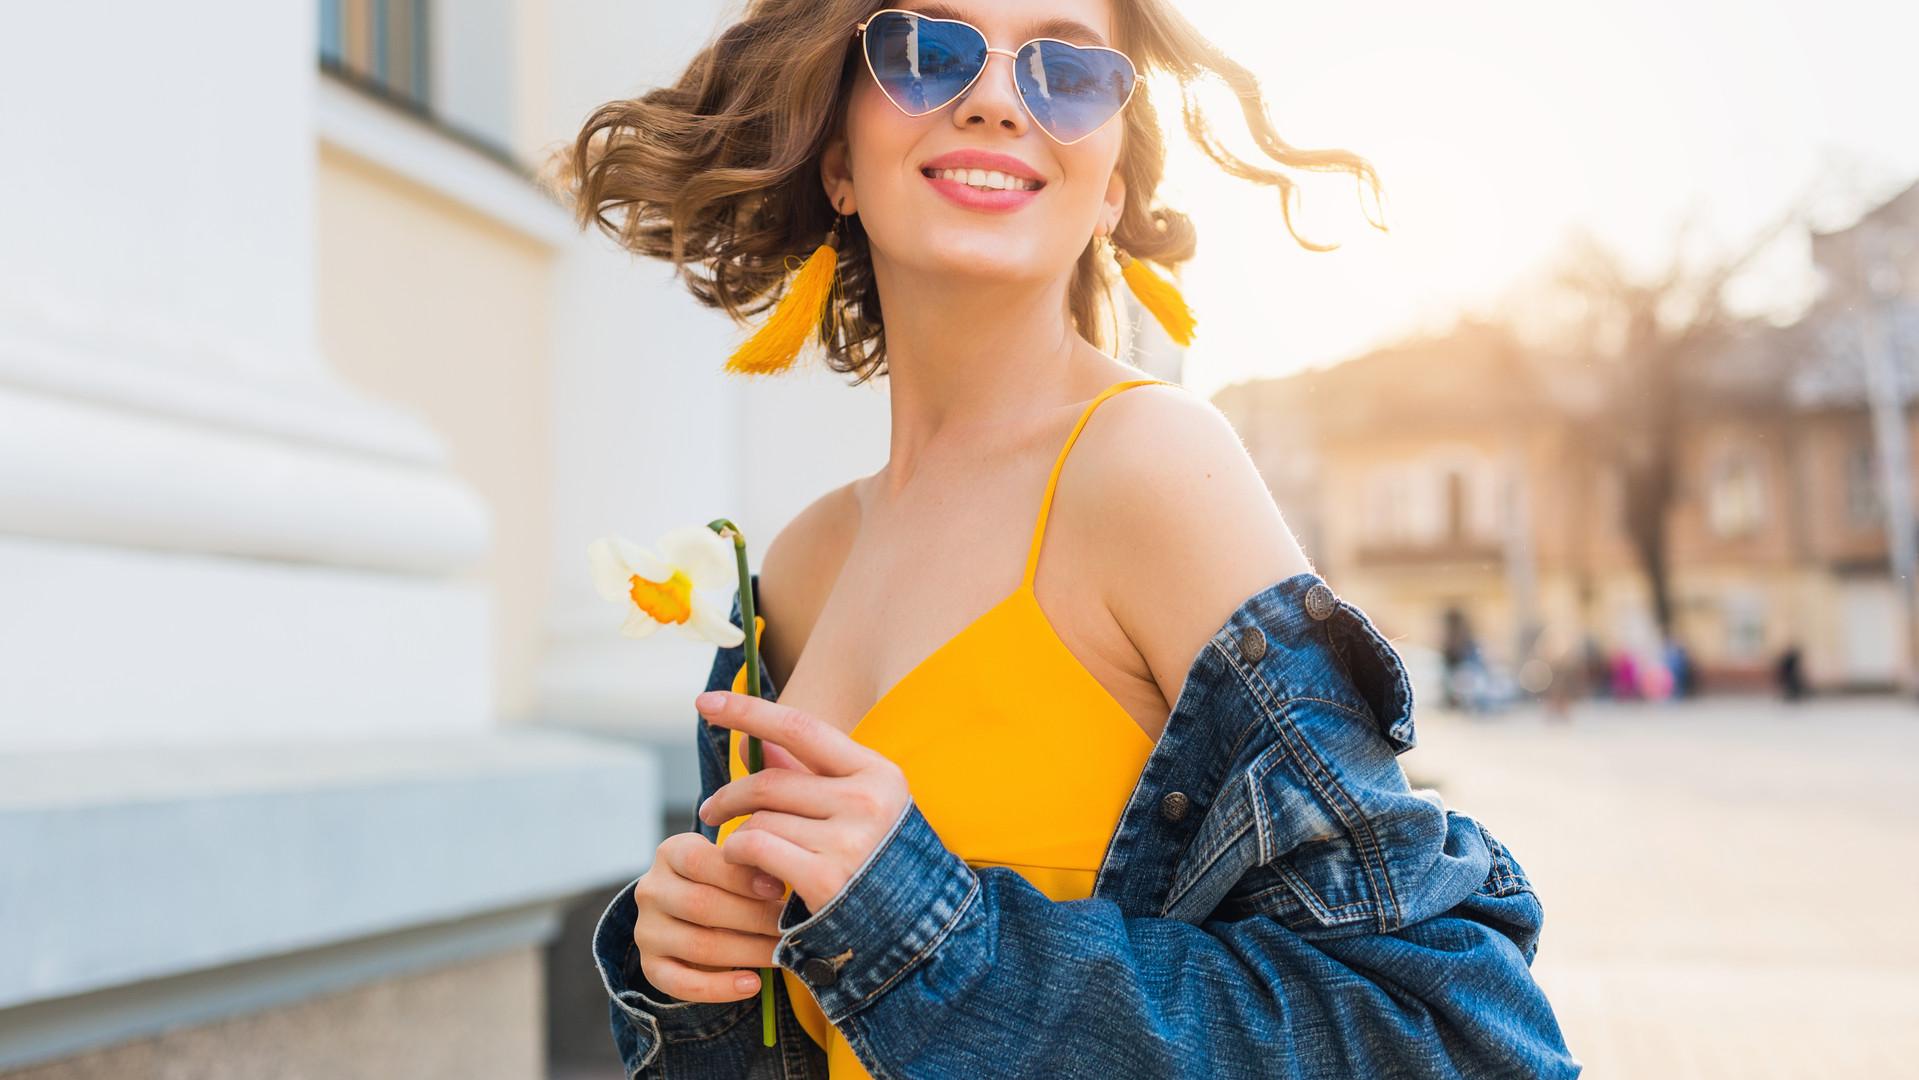 beautiful-woman-waving-hair-smiling-styl